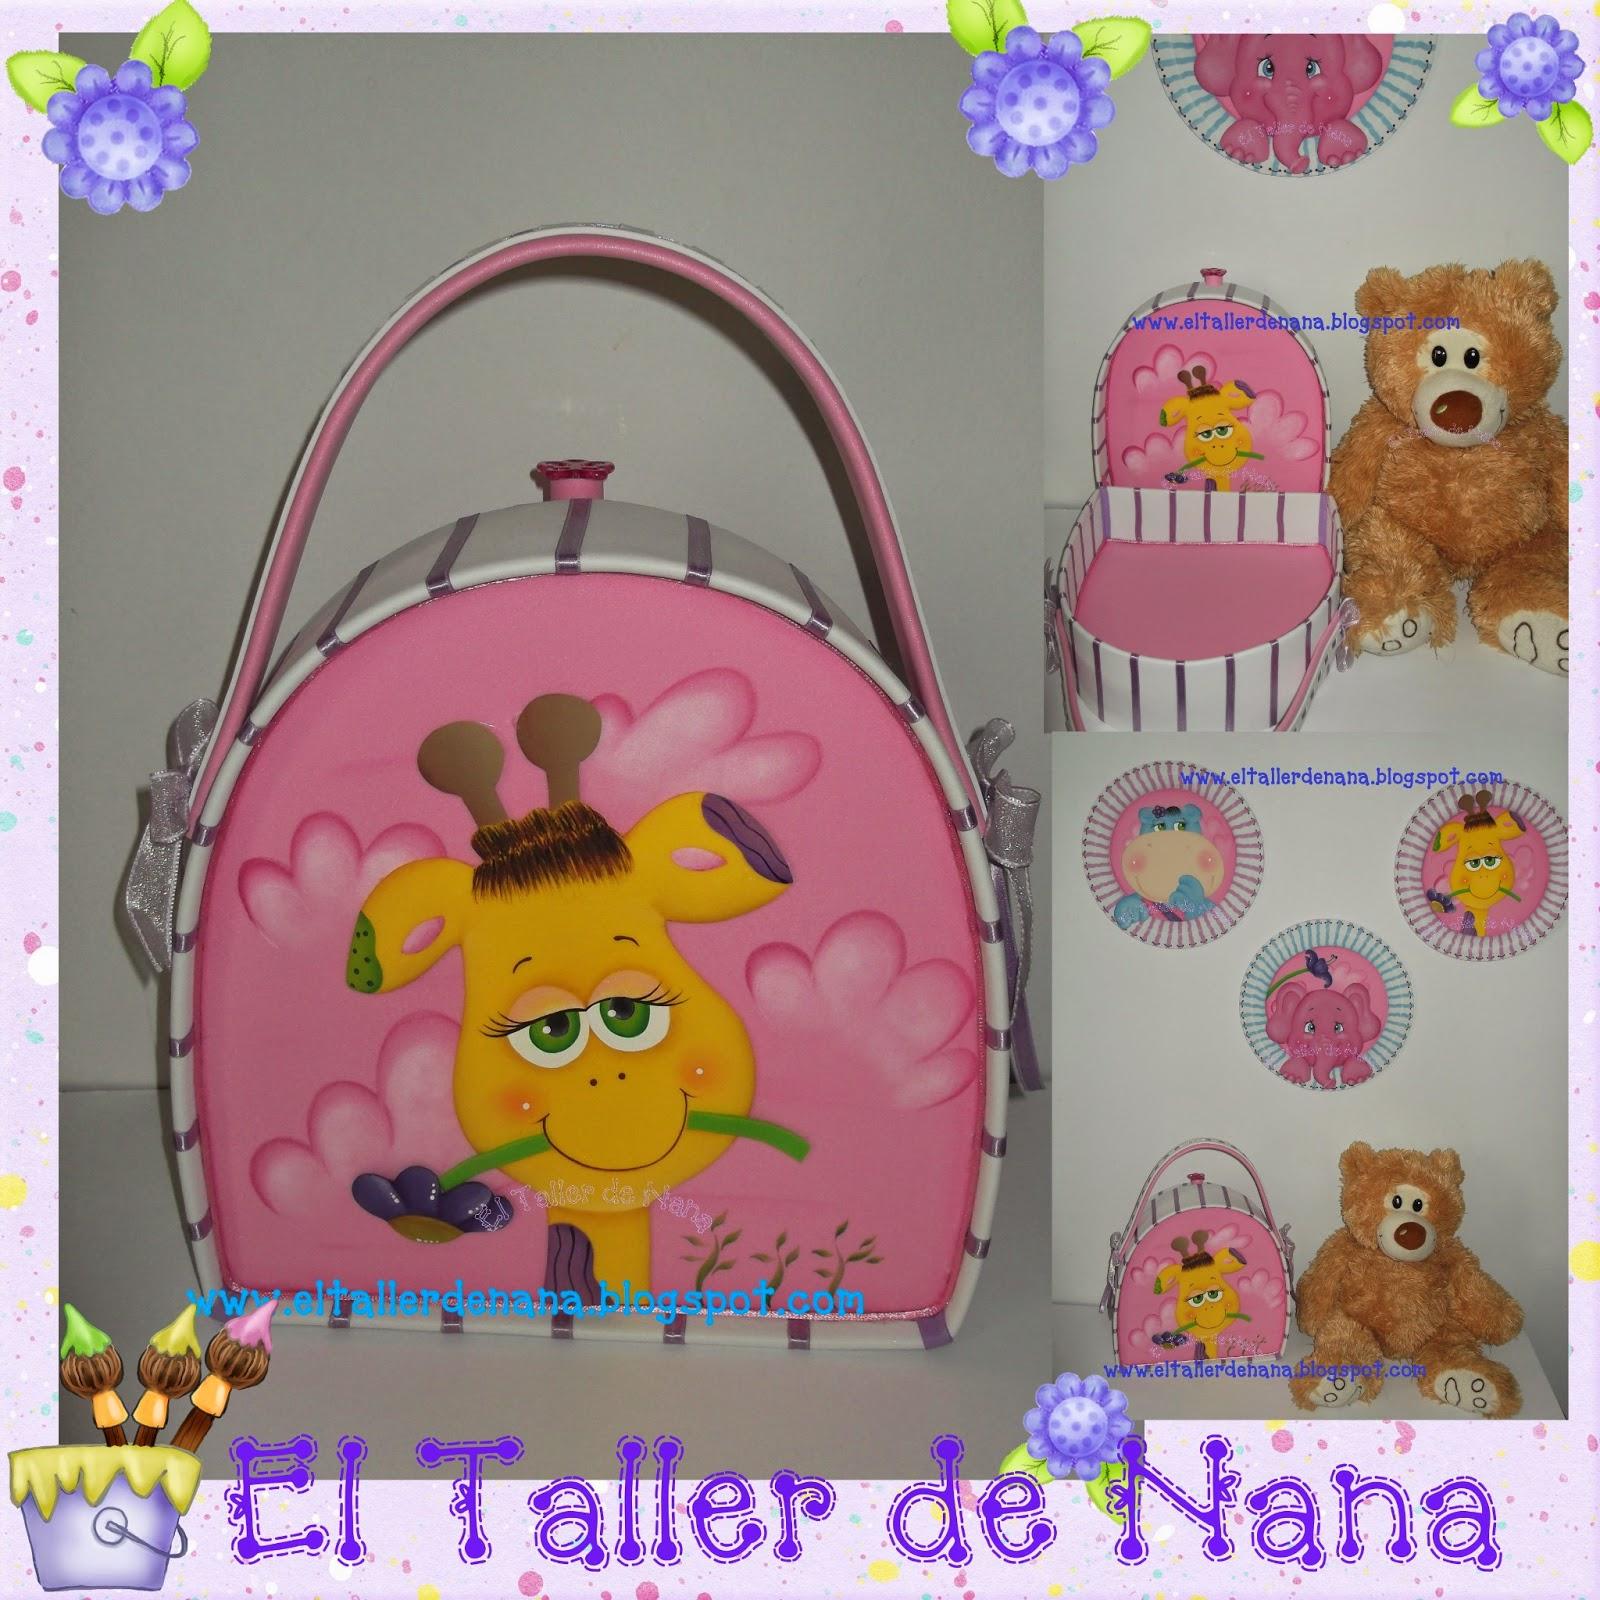 El Taller de Nana: Decoración Habitación Infantil para Niña en Foami.